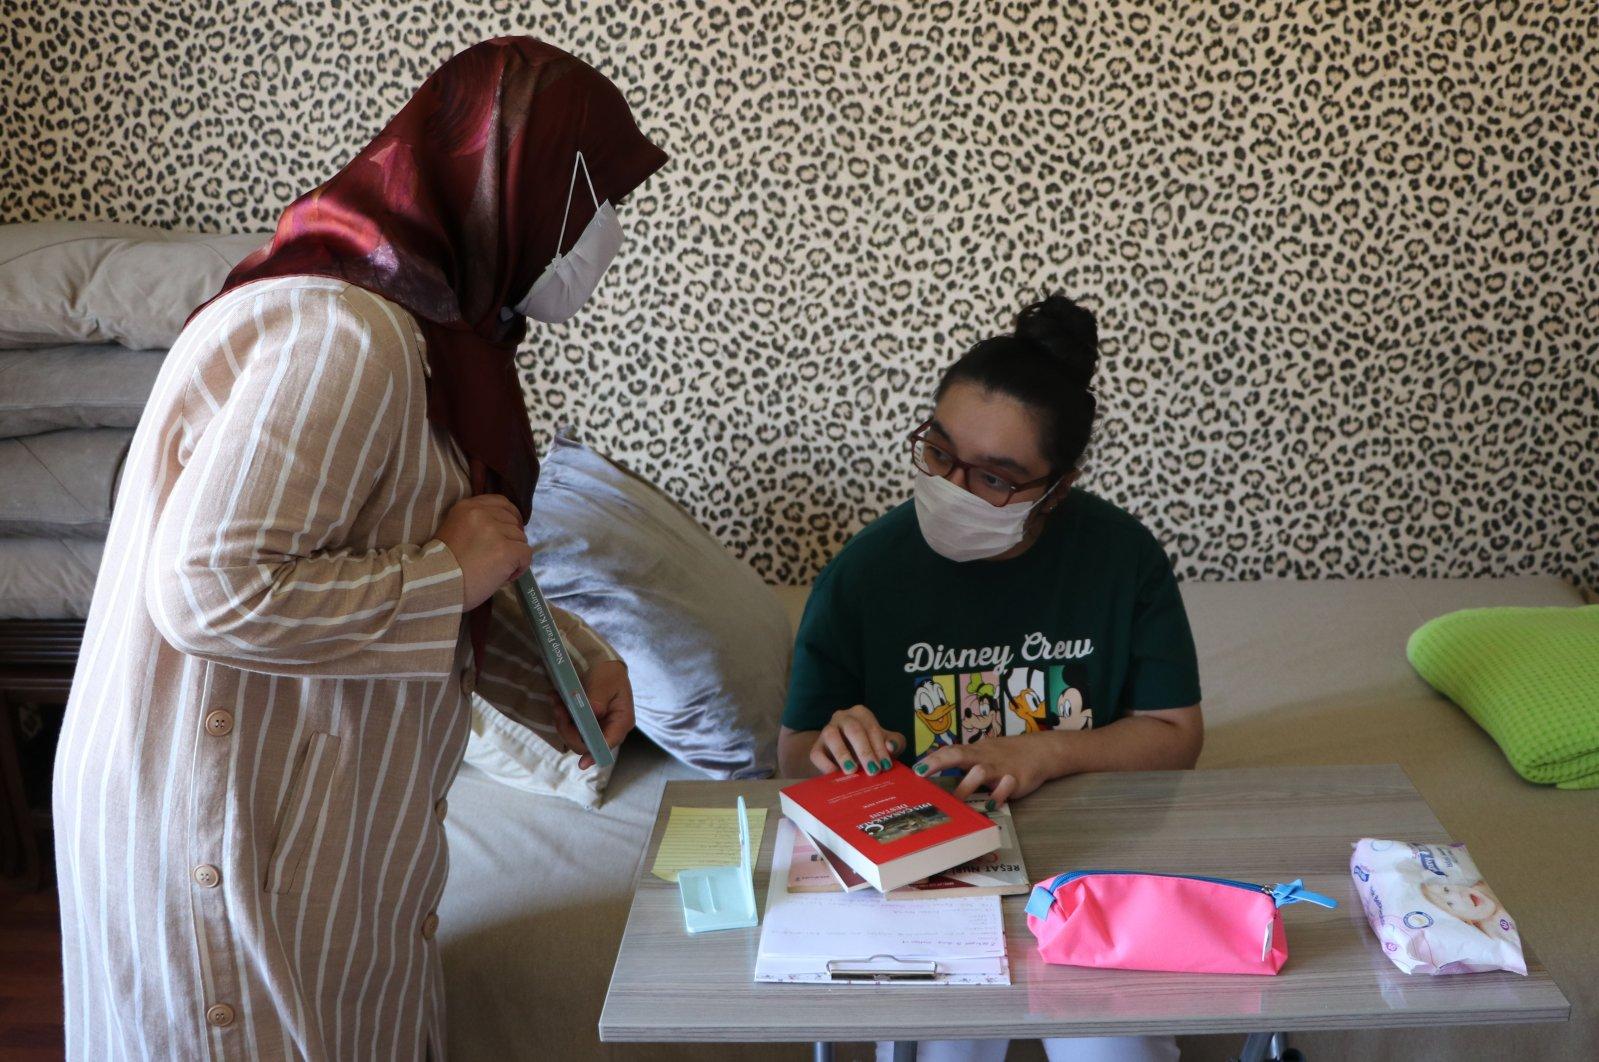 A municipality official delivers books to Beyzanur Yaren Şireli (R) in Kahramanmaraş, southern Turkey, Sept. 7, 2020. (AA Photo)